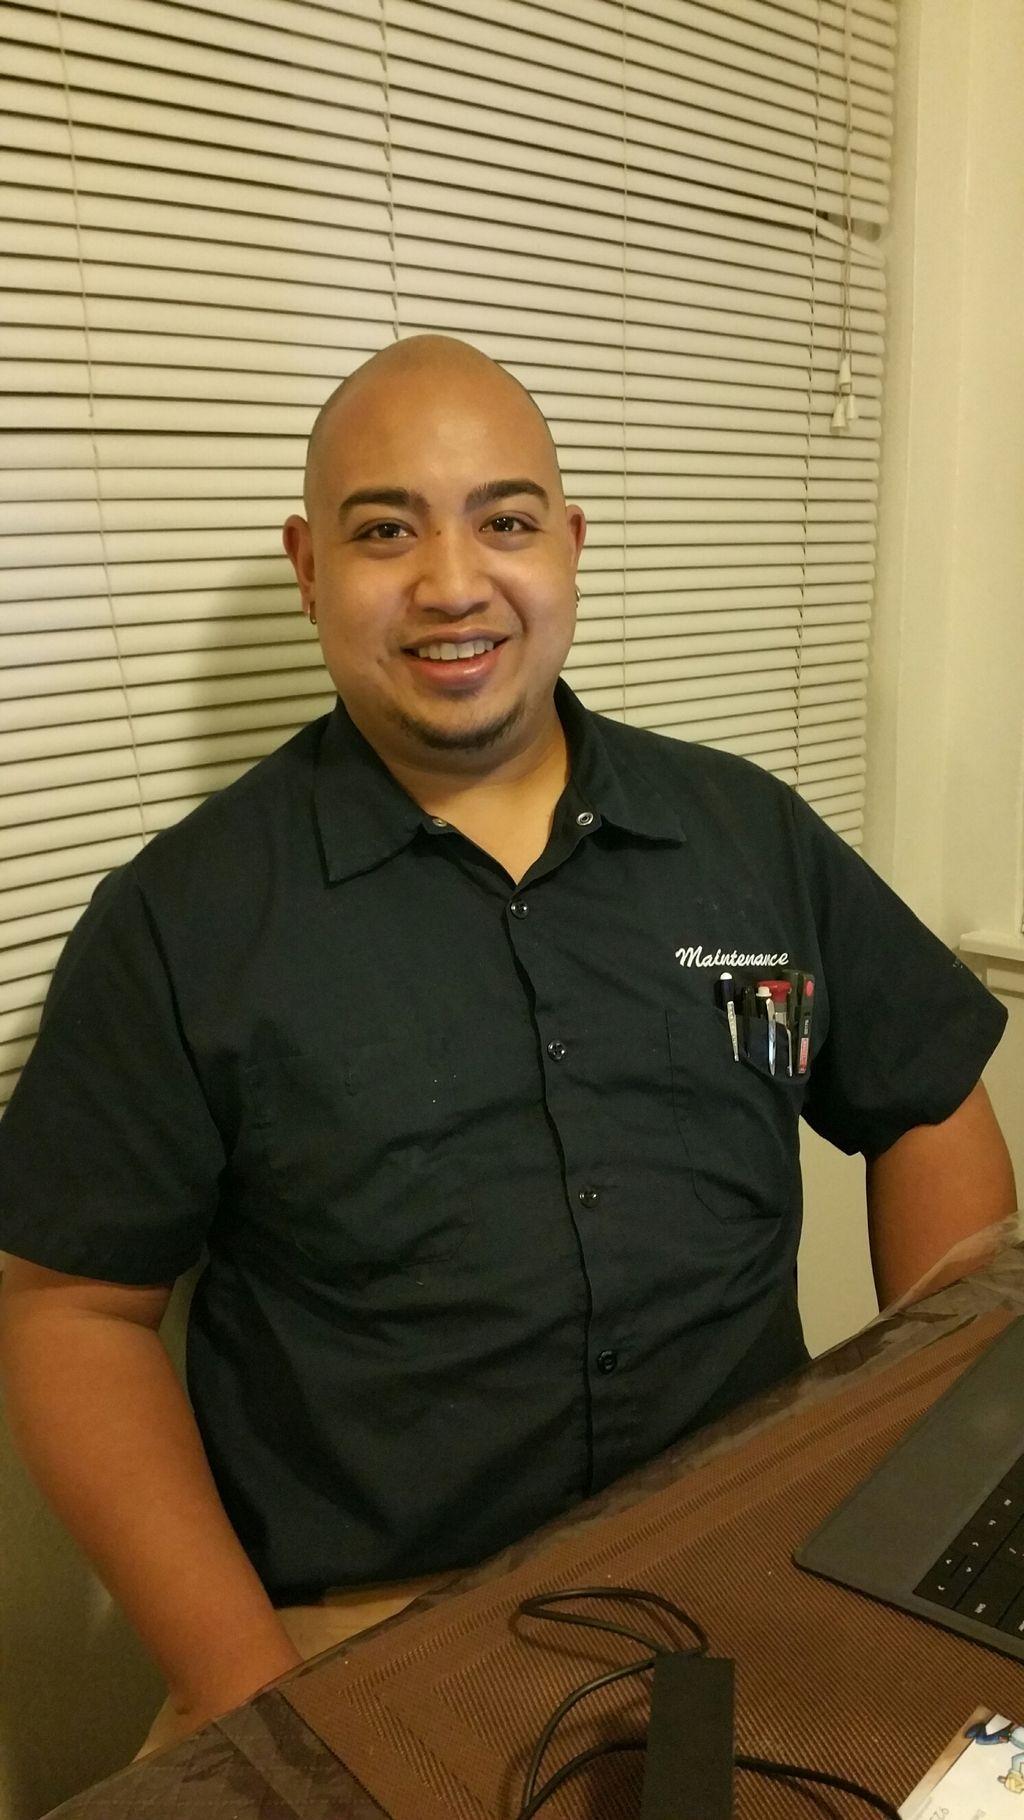 Gleo's Handyman Services